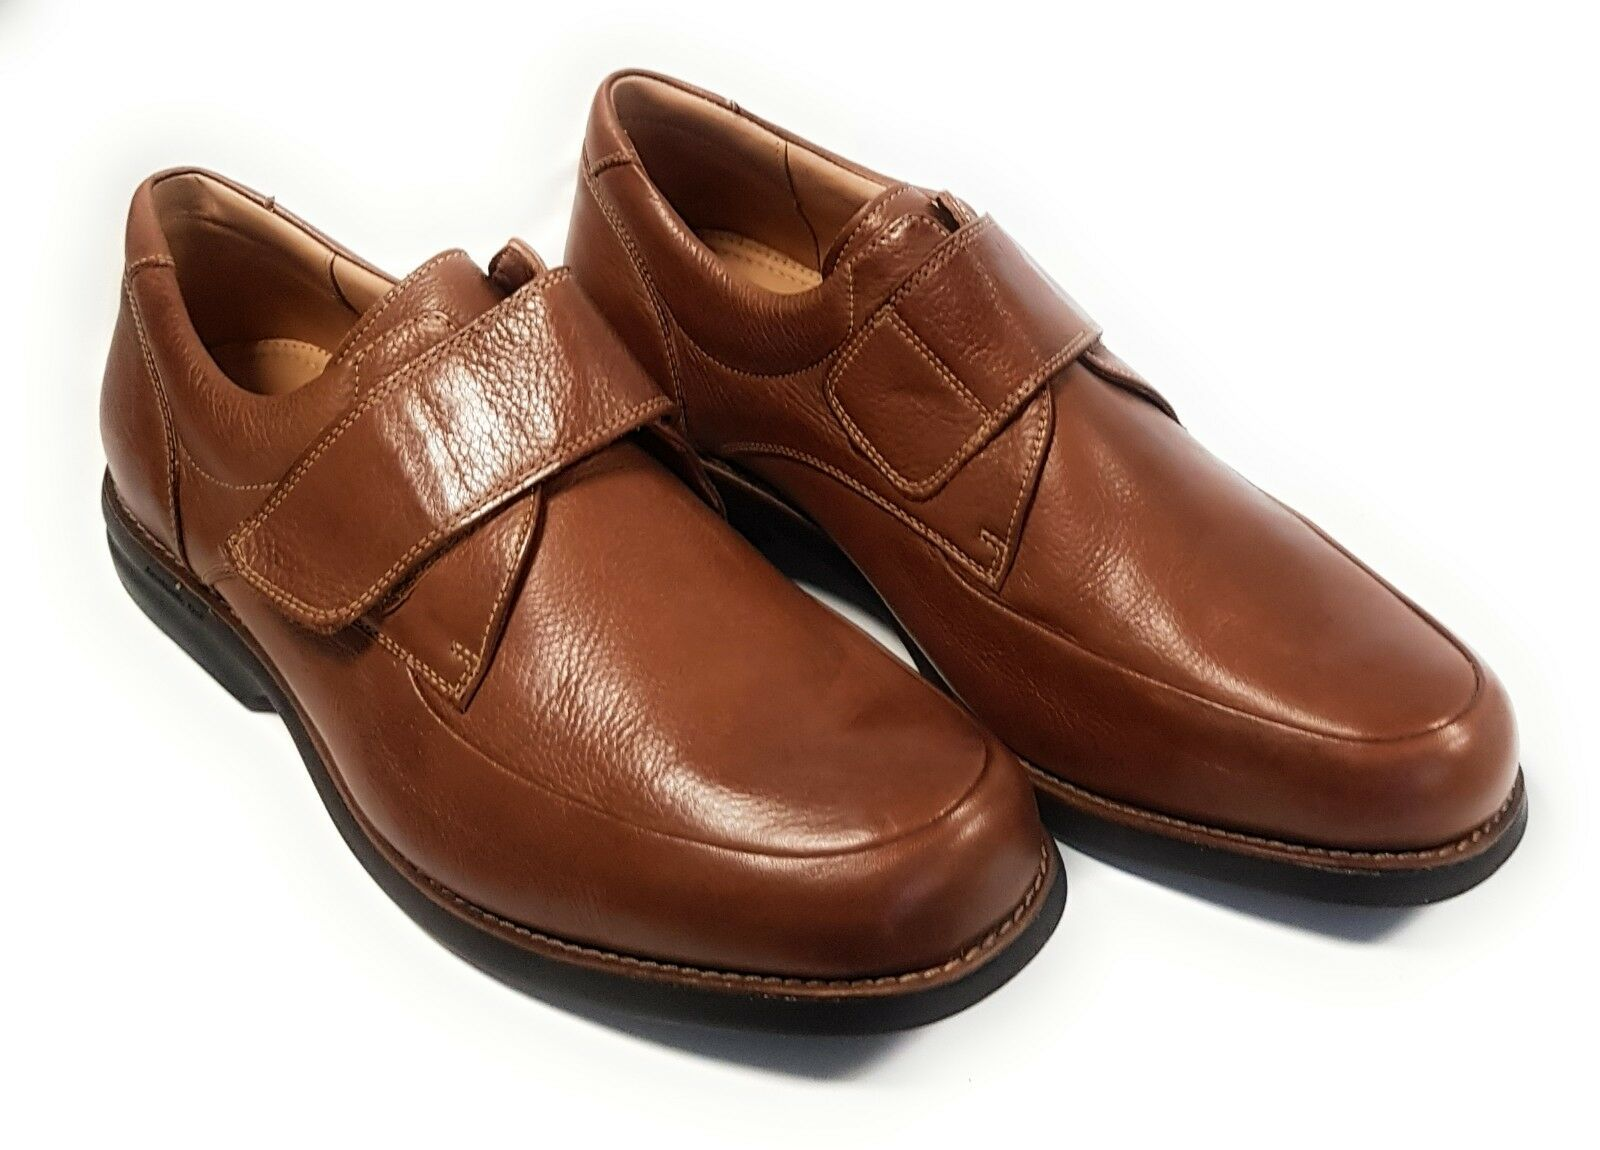 TAPAJOS Anatomic The Comfort Halbschuhe Shoemakers Herren Schuhe Slipper Halbschuhe Comfort 68c9a6